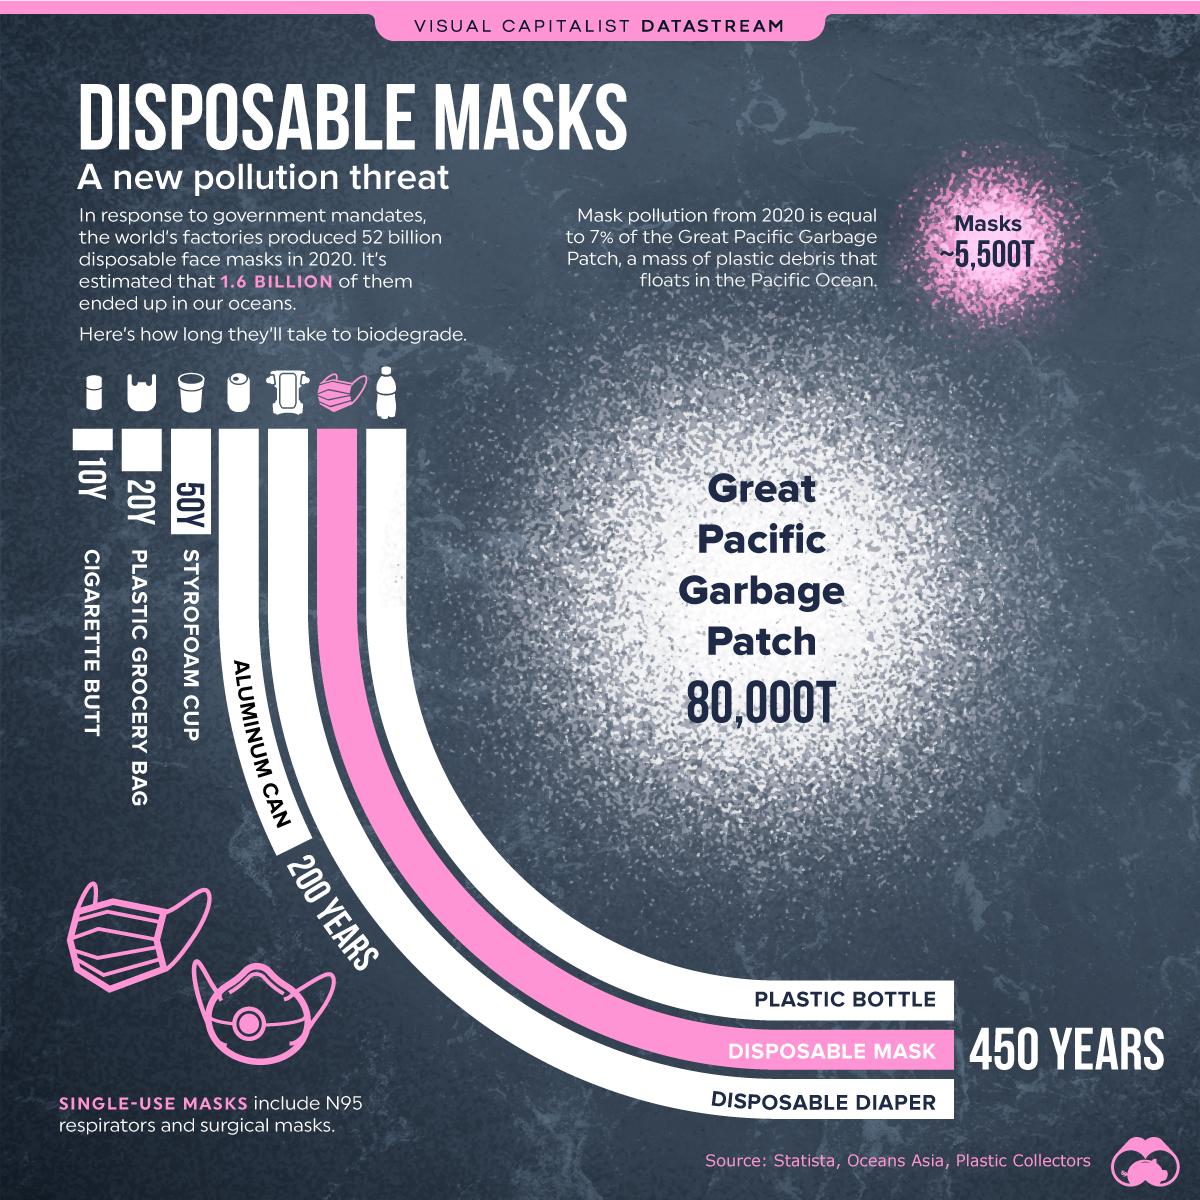 Забруднення океану масками